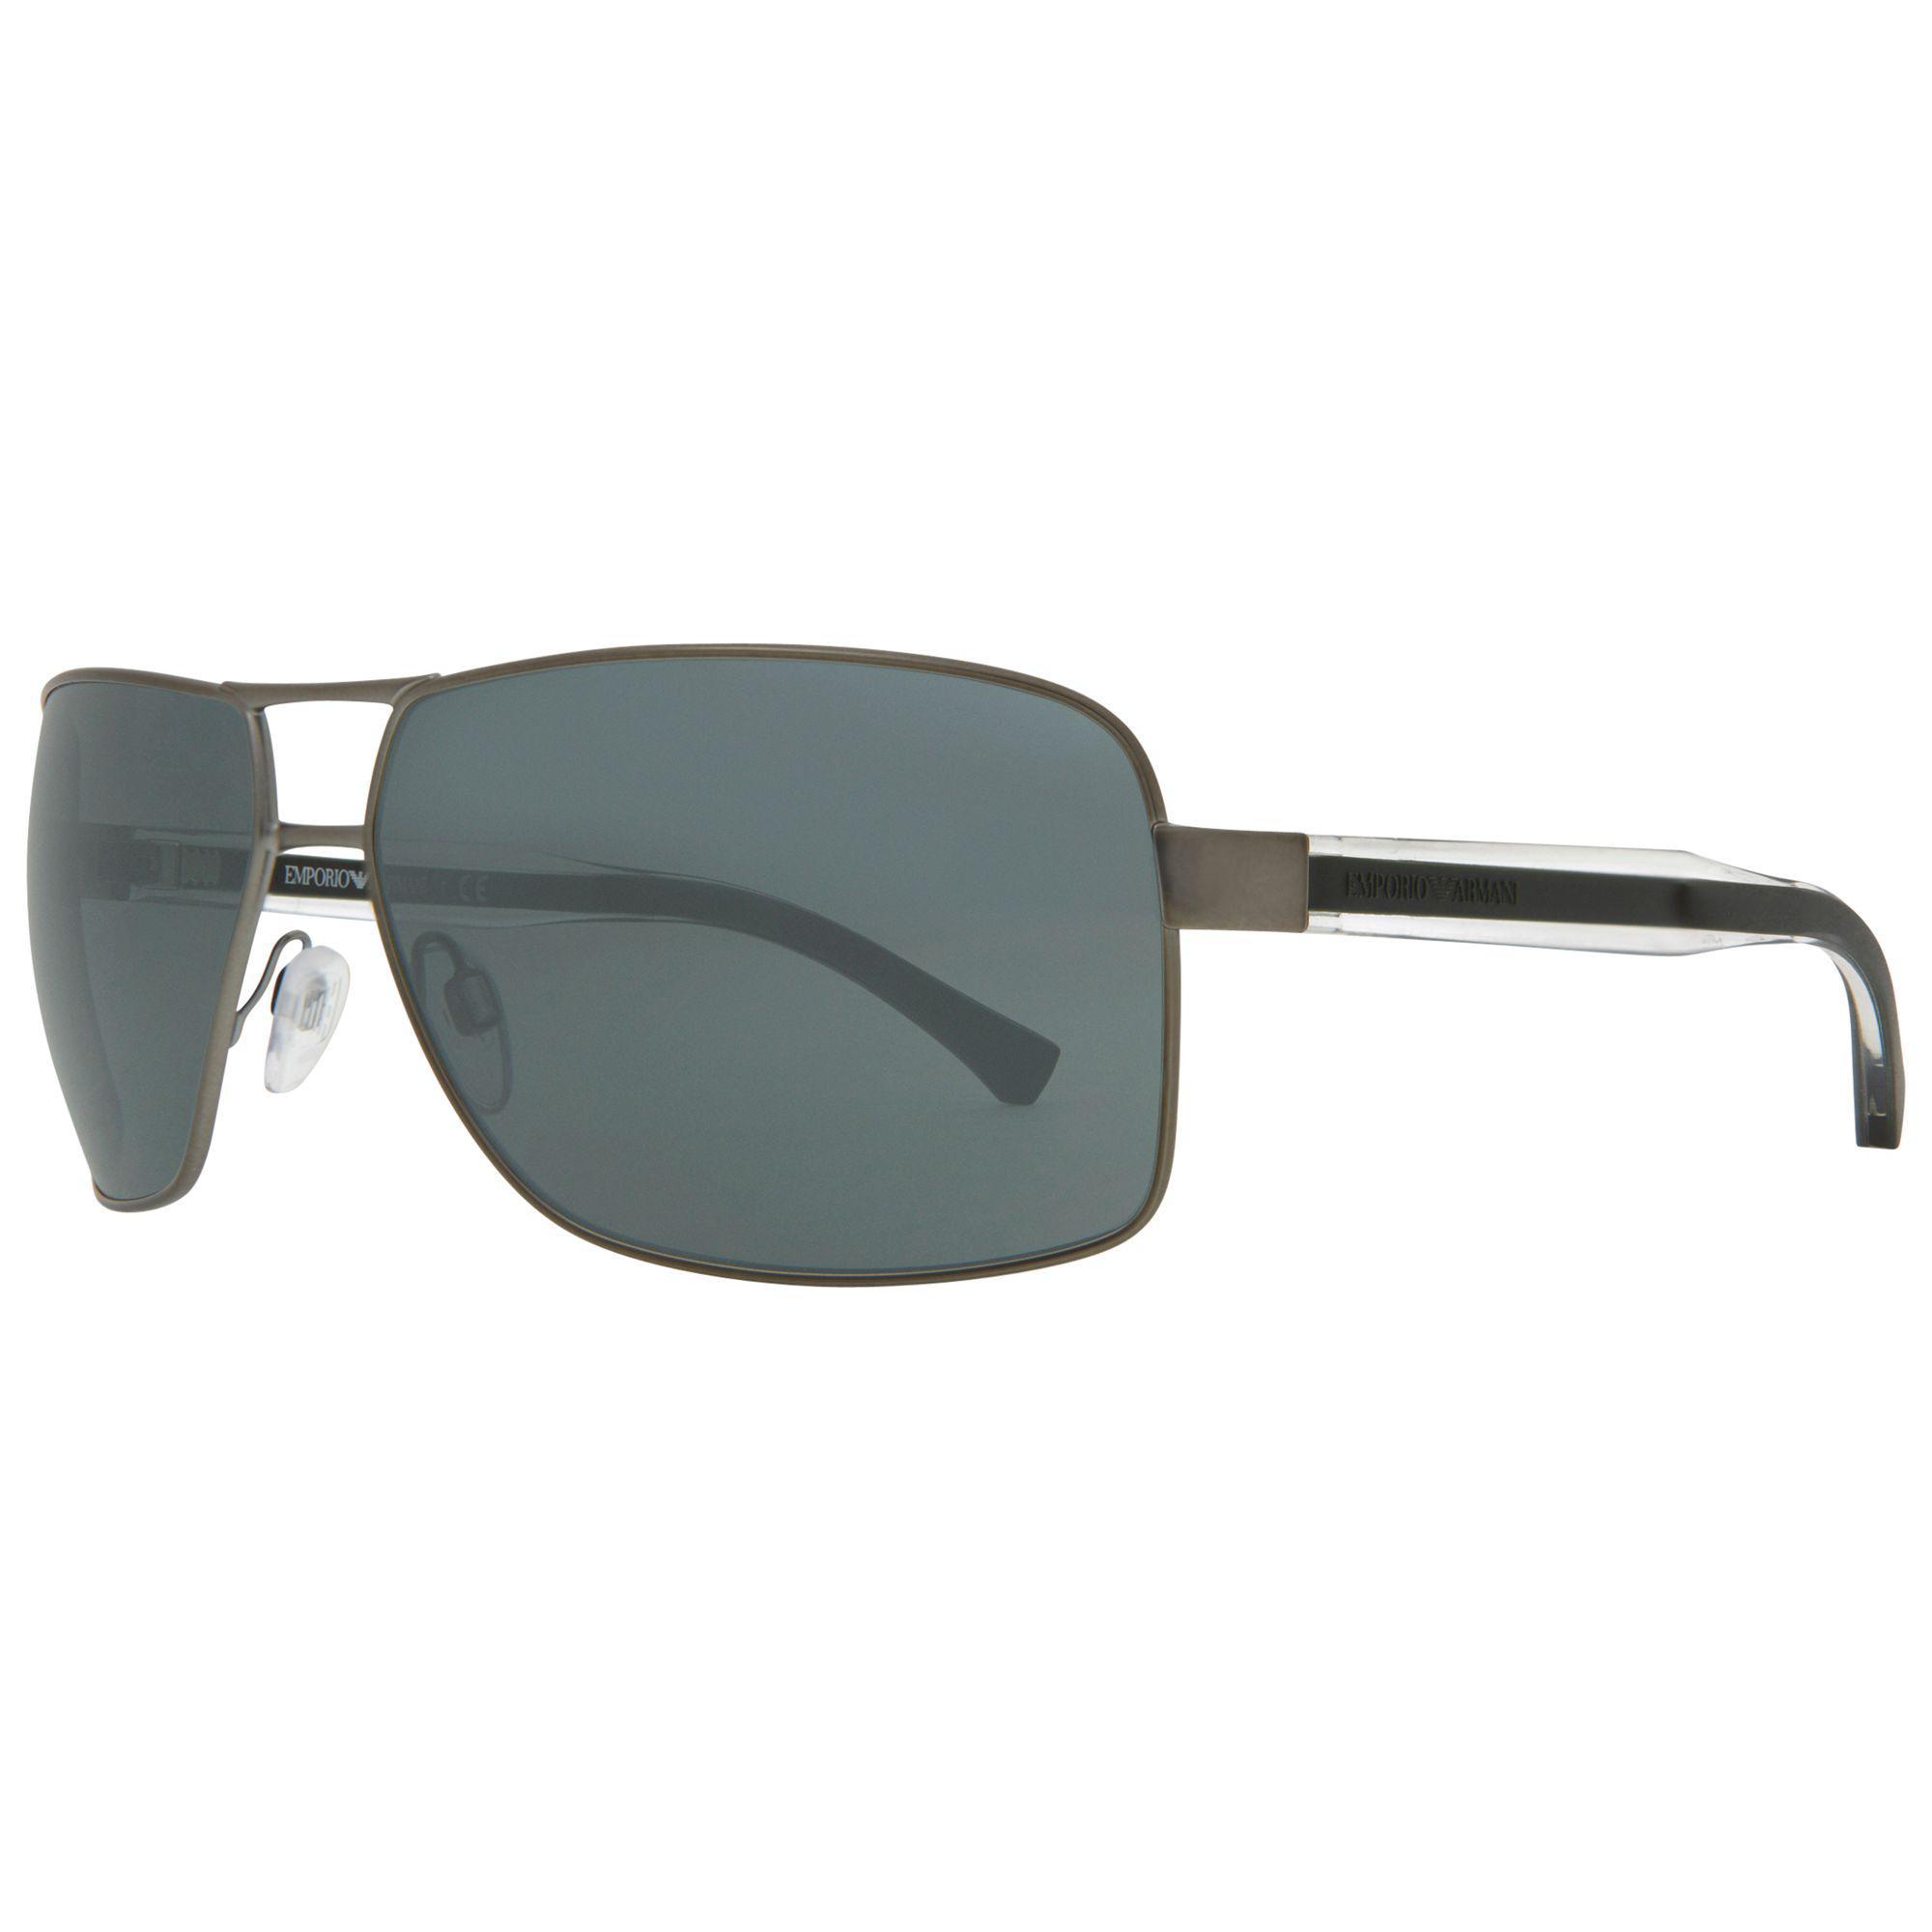 a727a8ea2235 Emporio Armani Ea2001 Rectangular Sunglasses in Gray for Men - Lyst